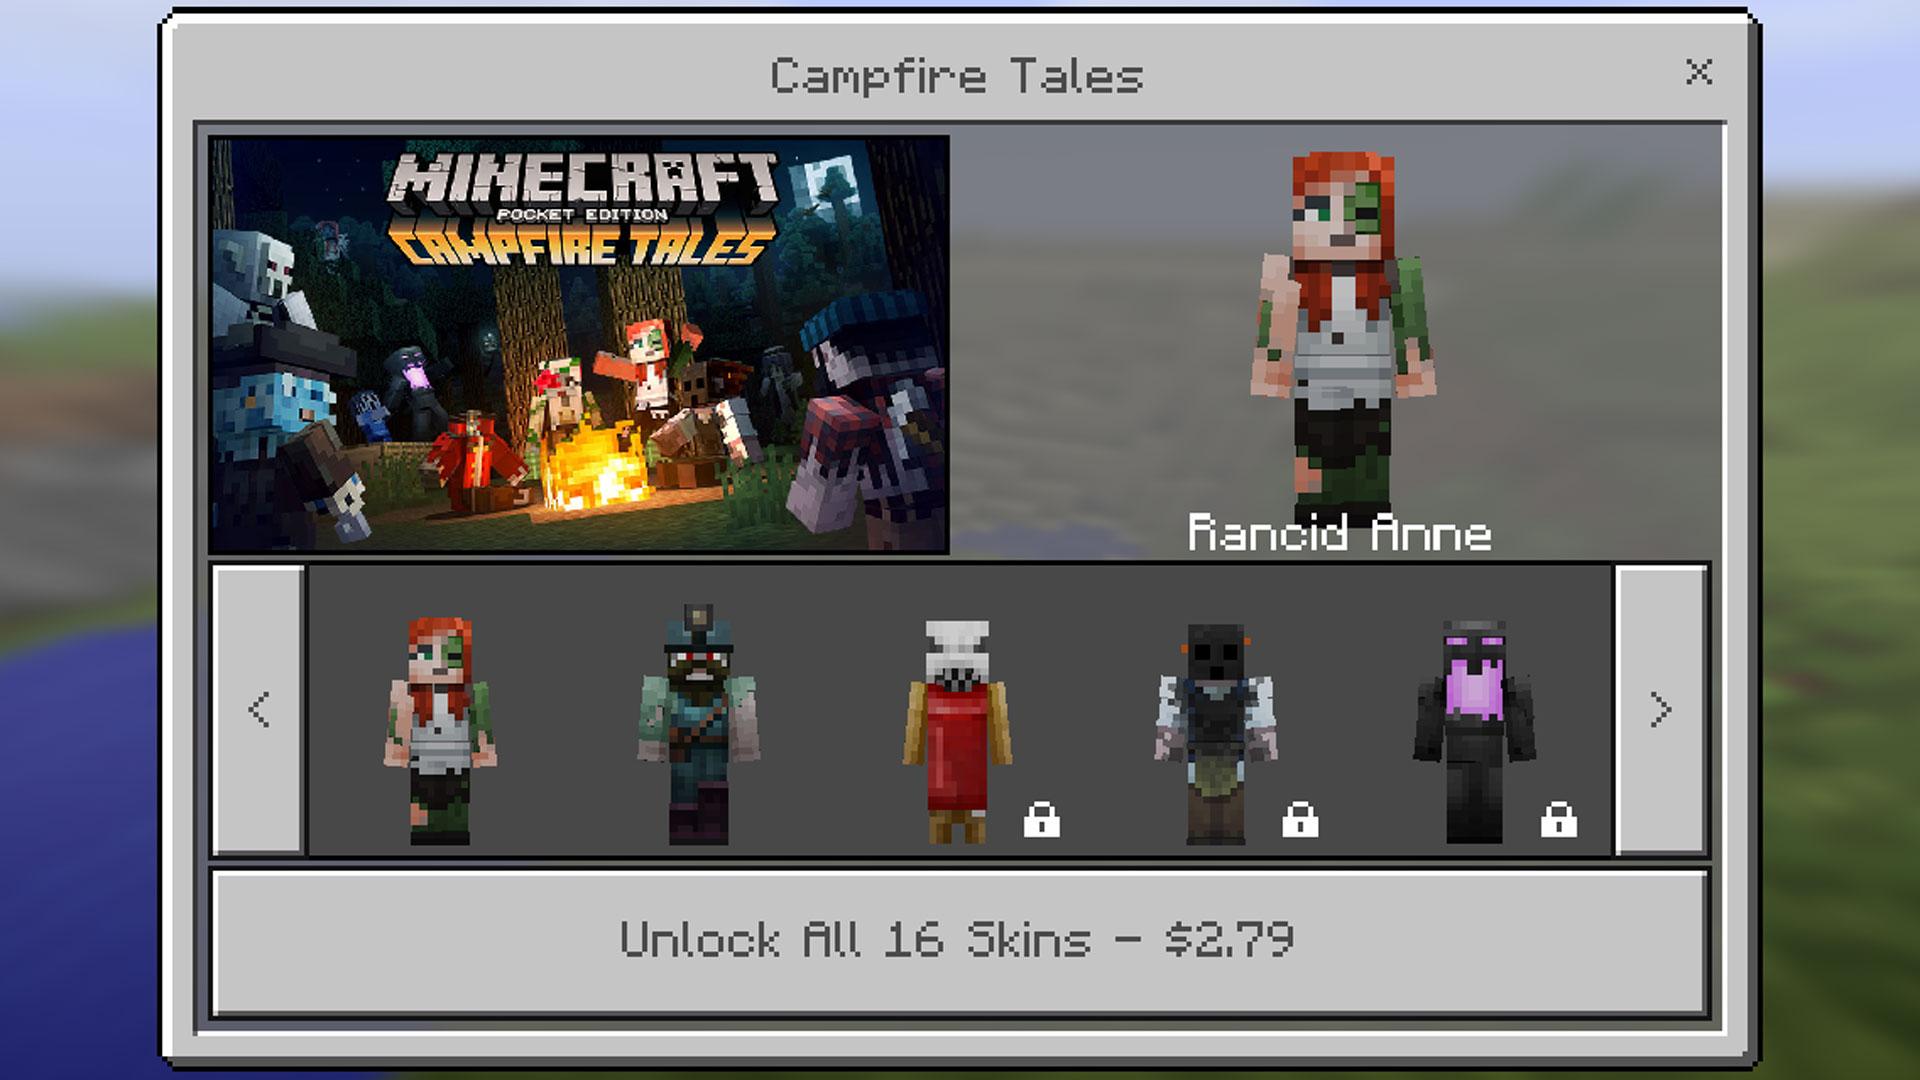 Minecraft Pocket Edition Campfire Tales Skin Pack